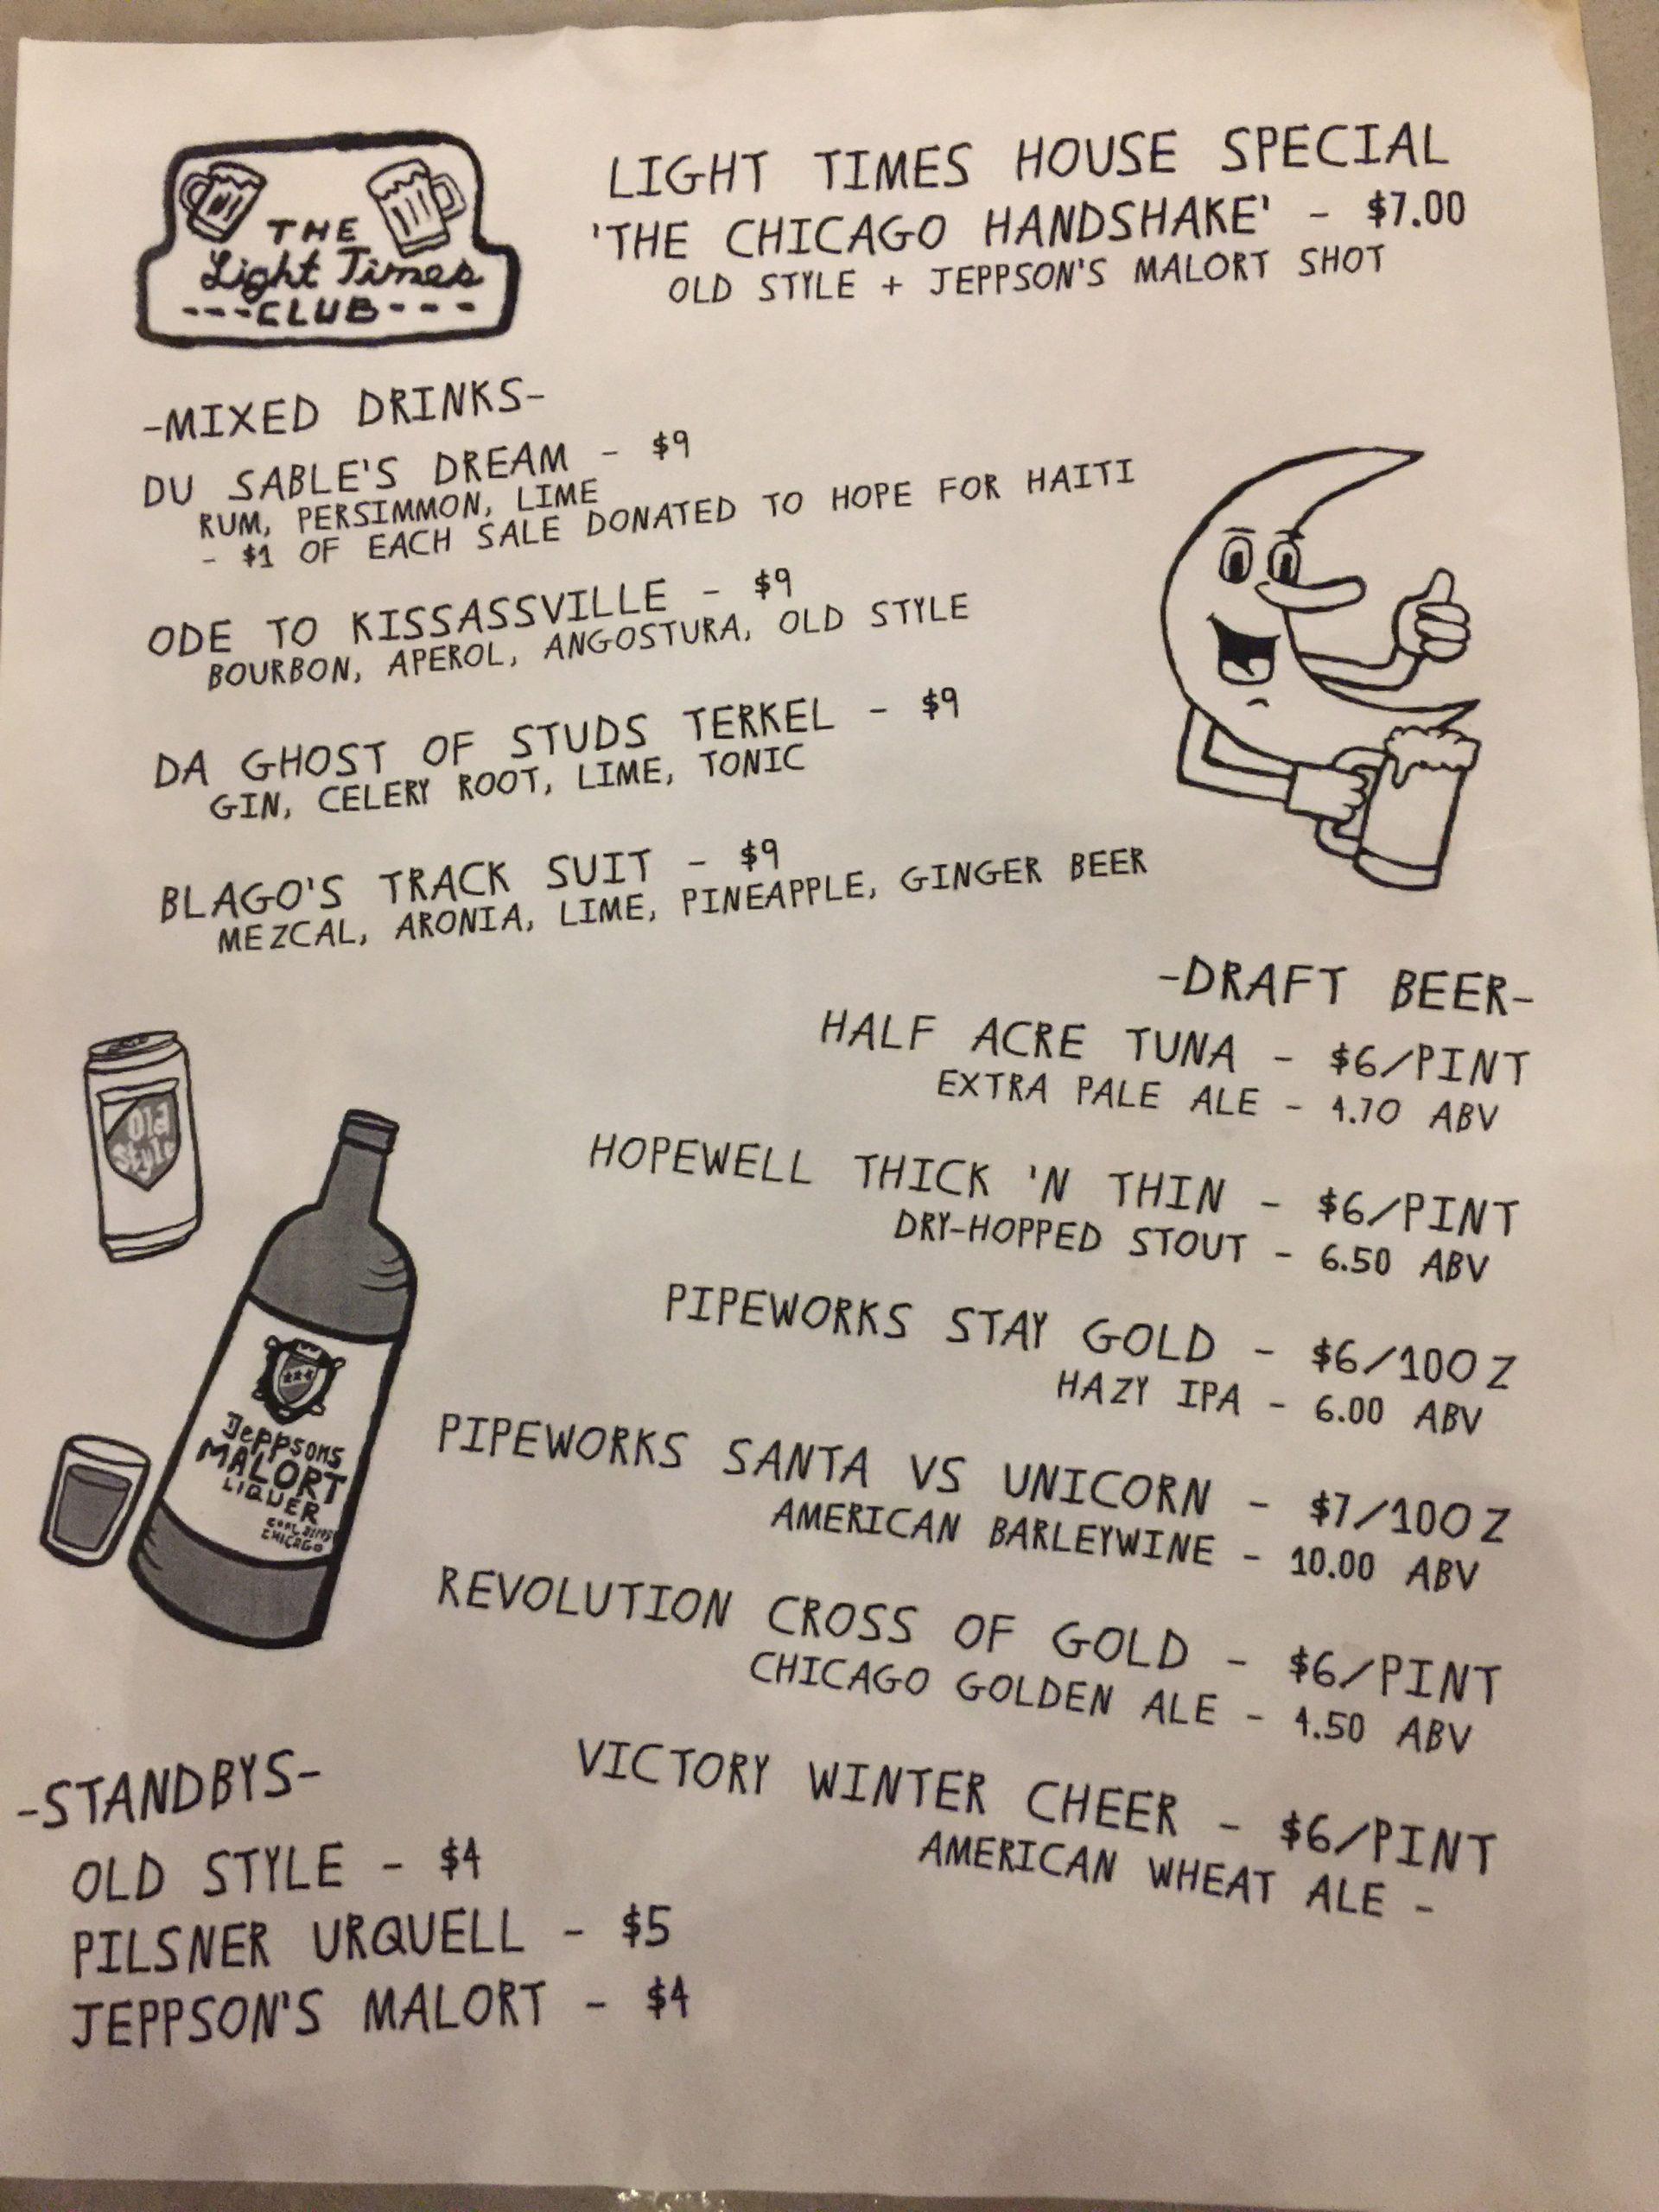 The drink menu at Light Times Club